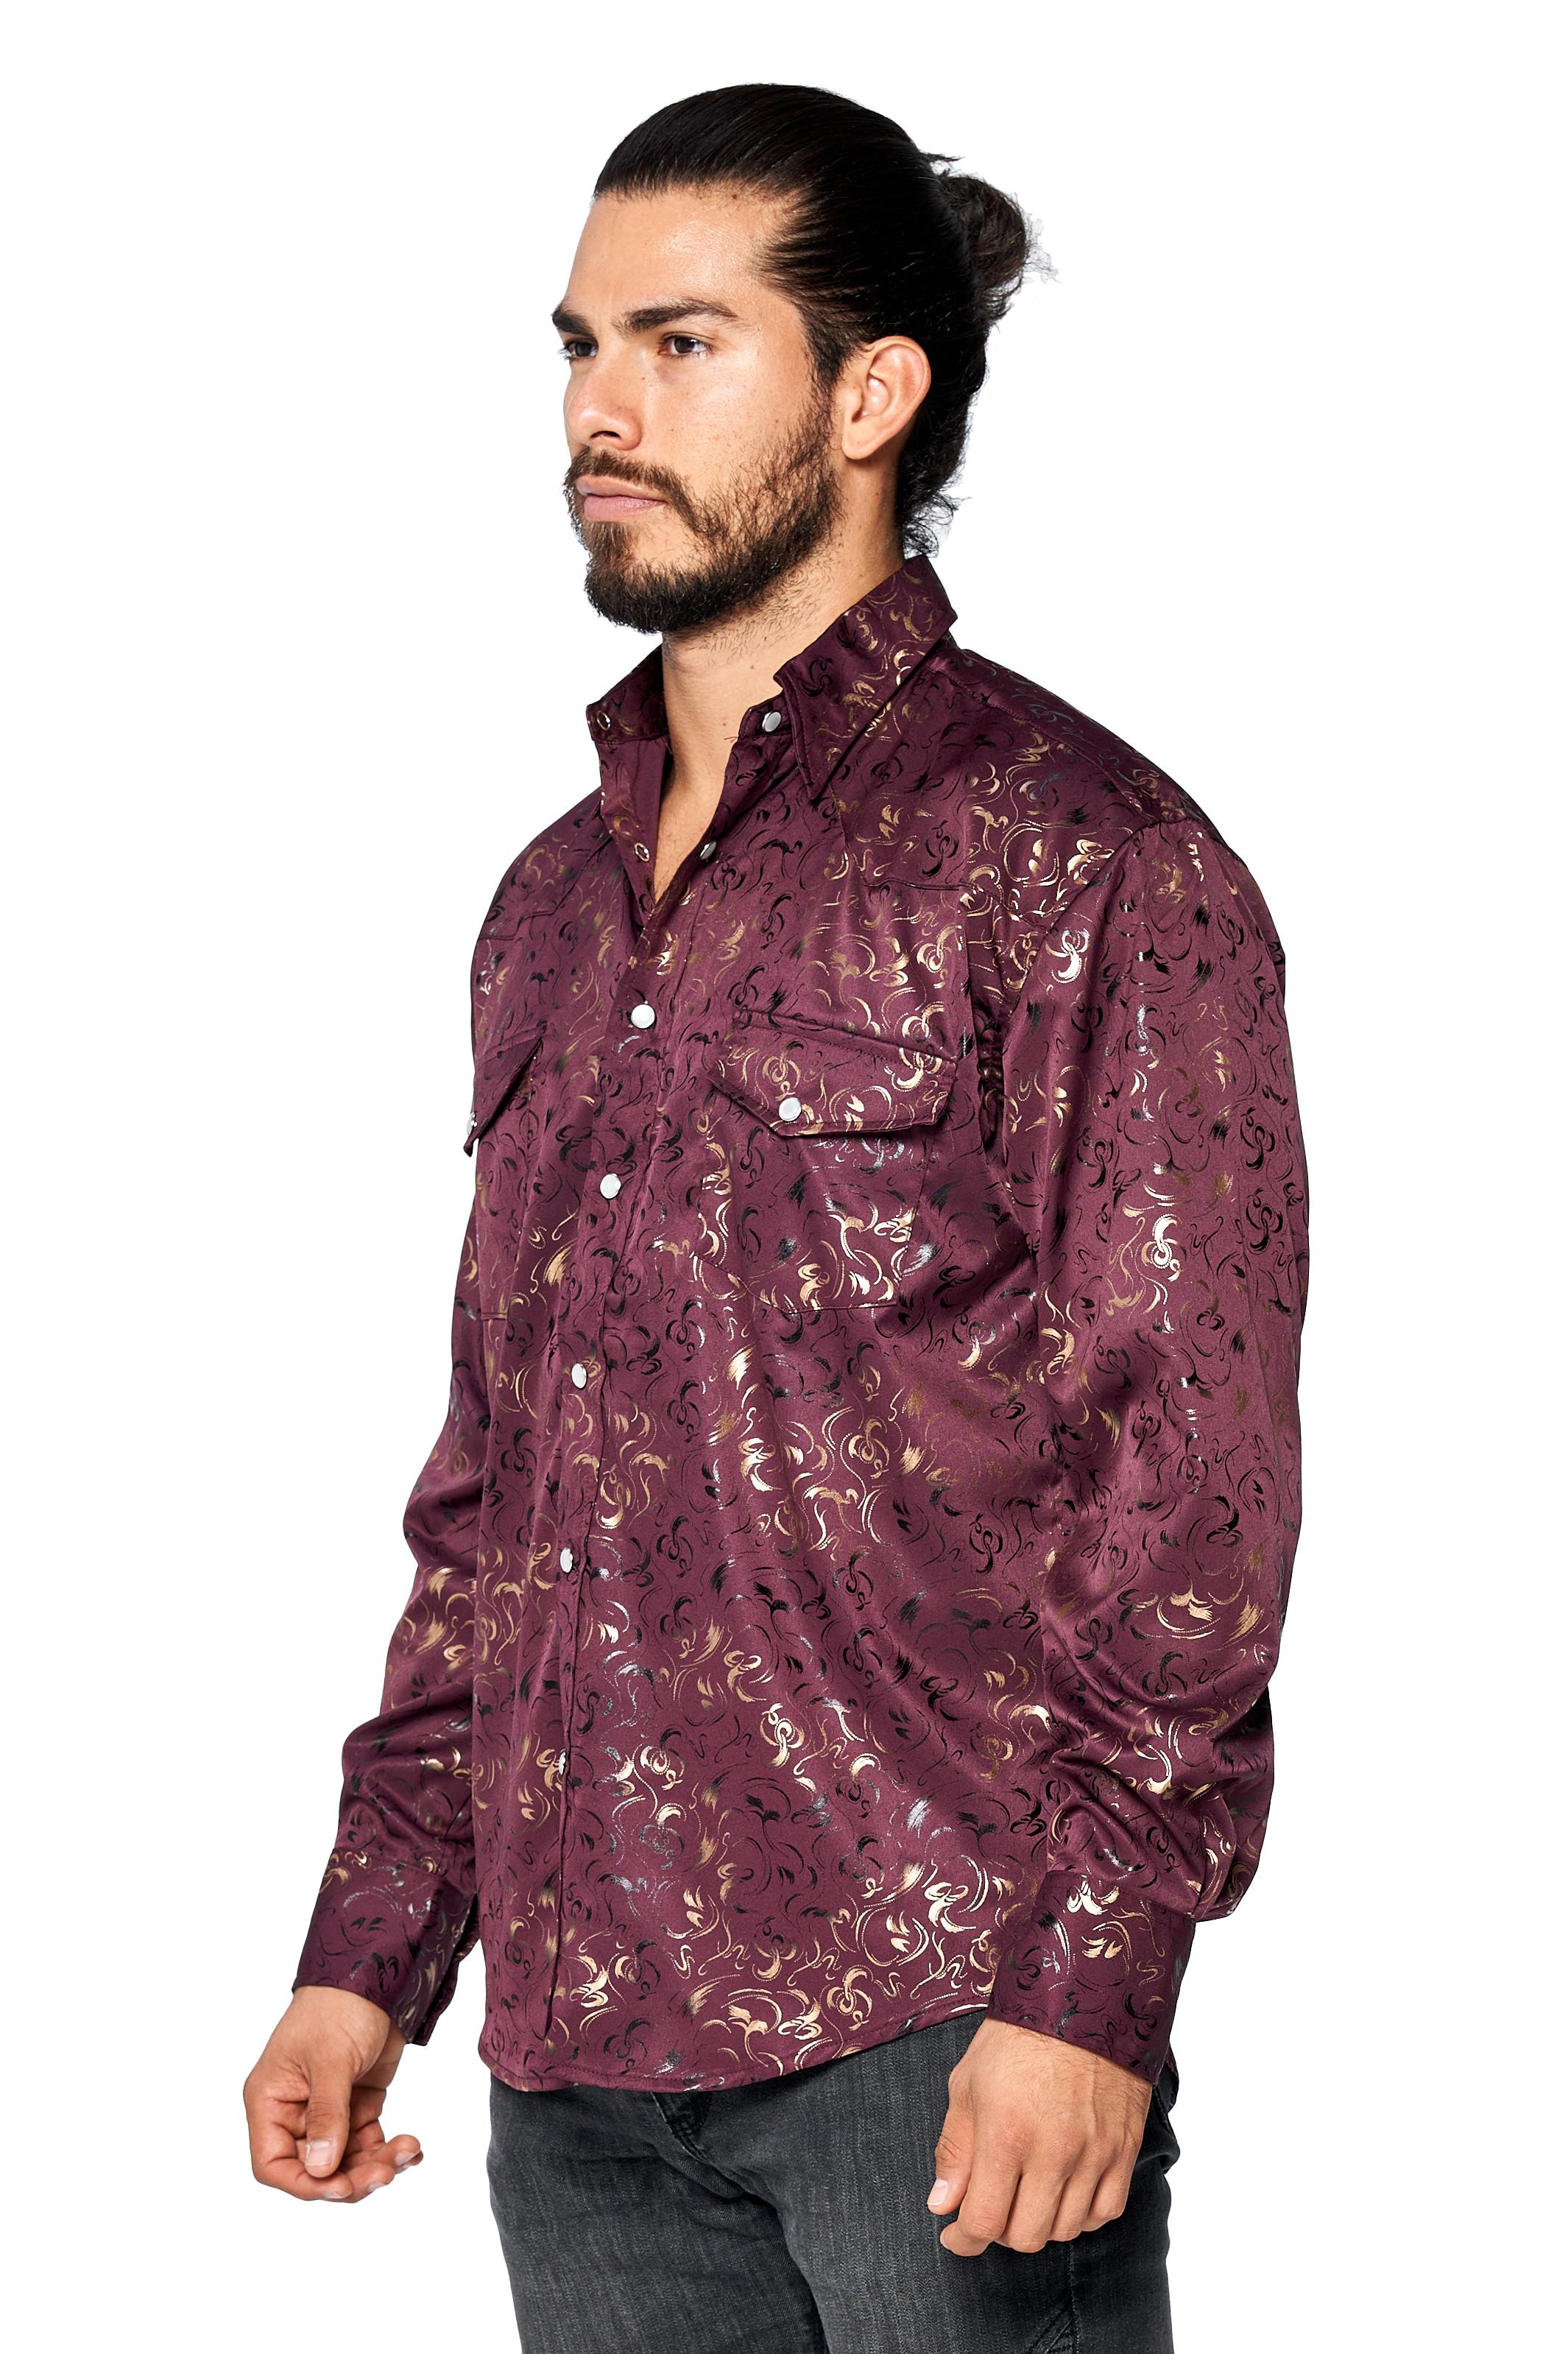 LW-Men-039-s-Pearl-Snap-Tribal-Stylish-Printed-Woven-Western-Vaquero-Rodeo-Shirt thumbnail 12